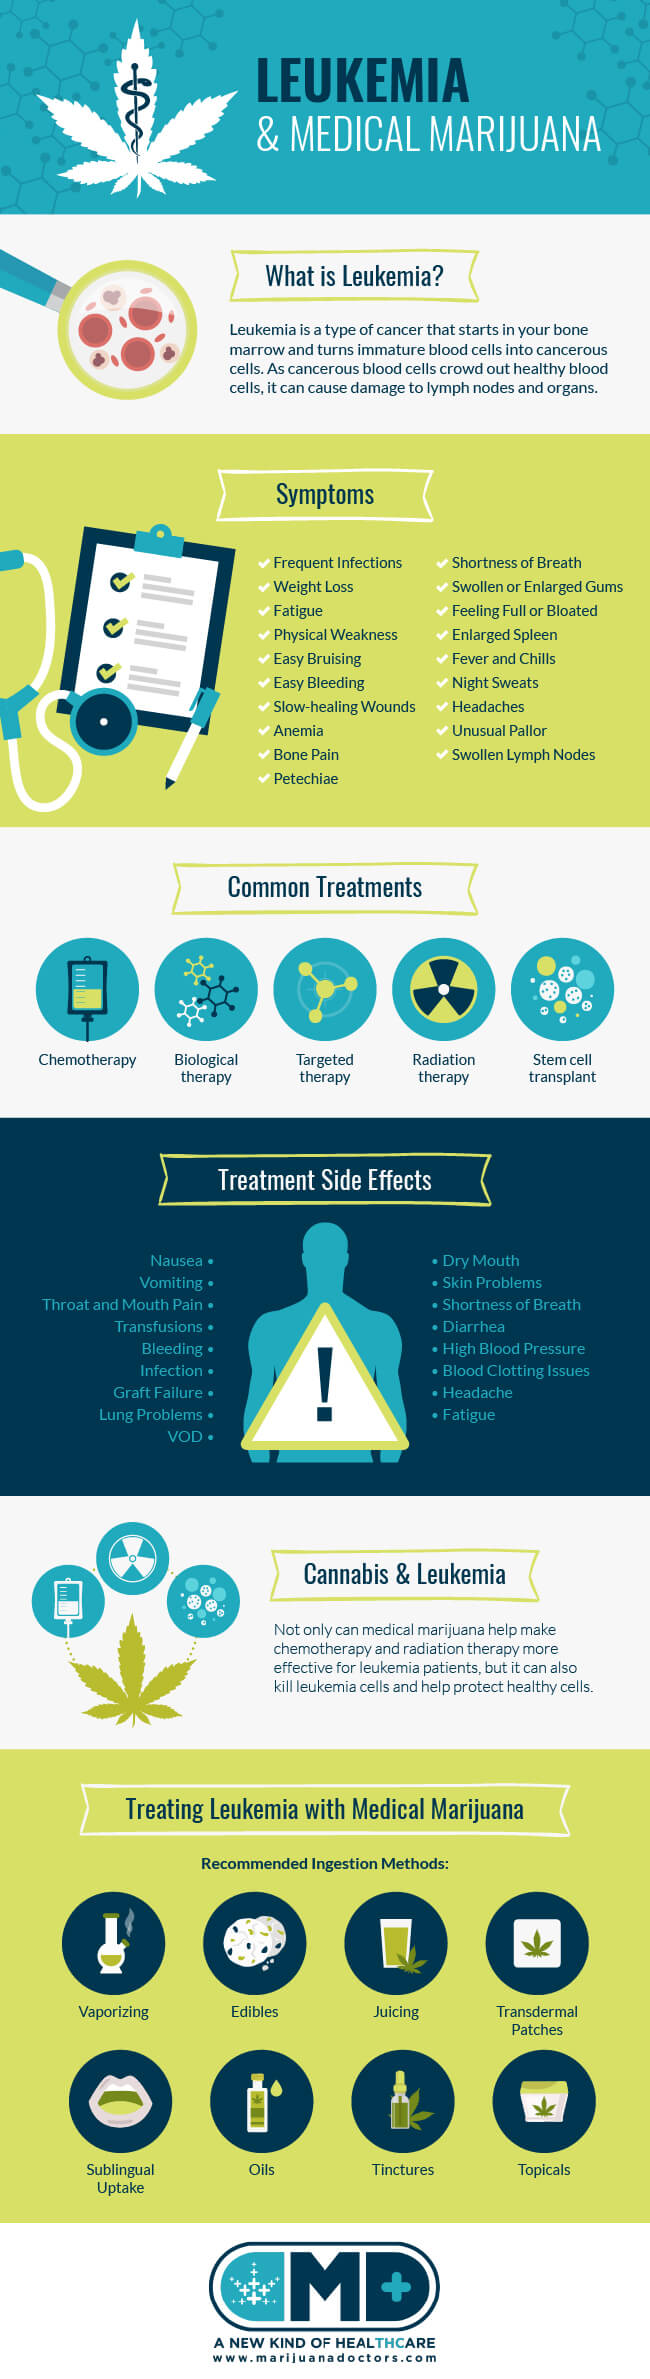 Leukemia and Medical Marijuana